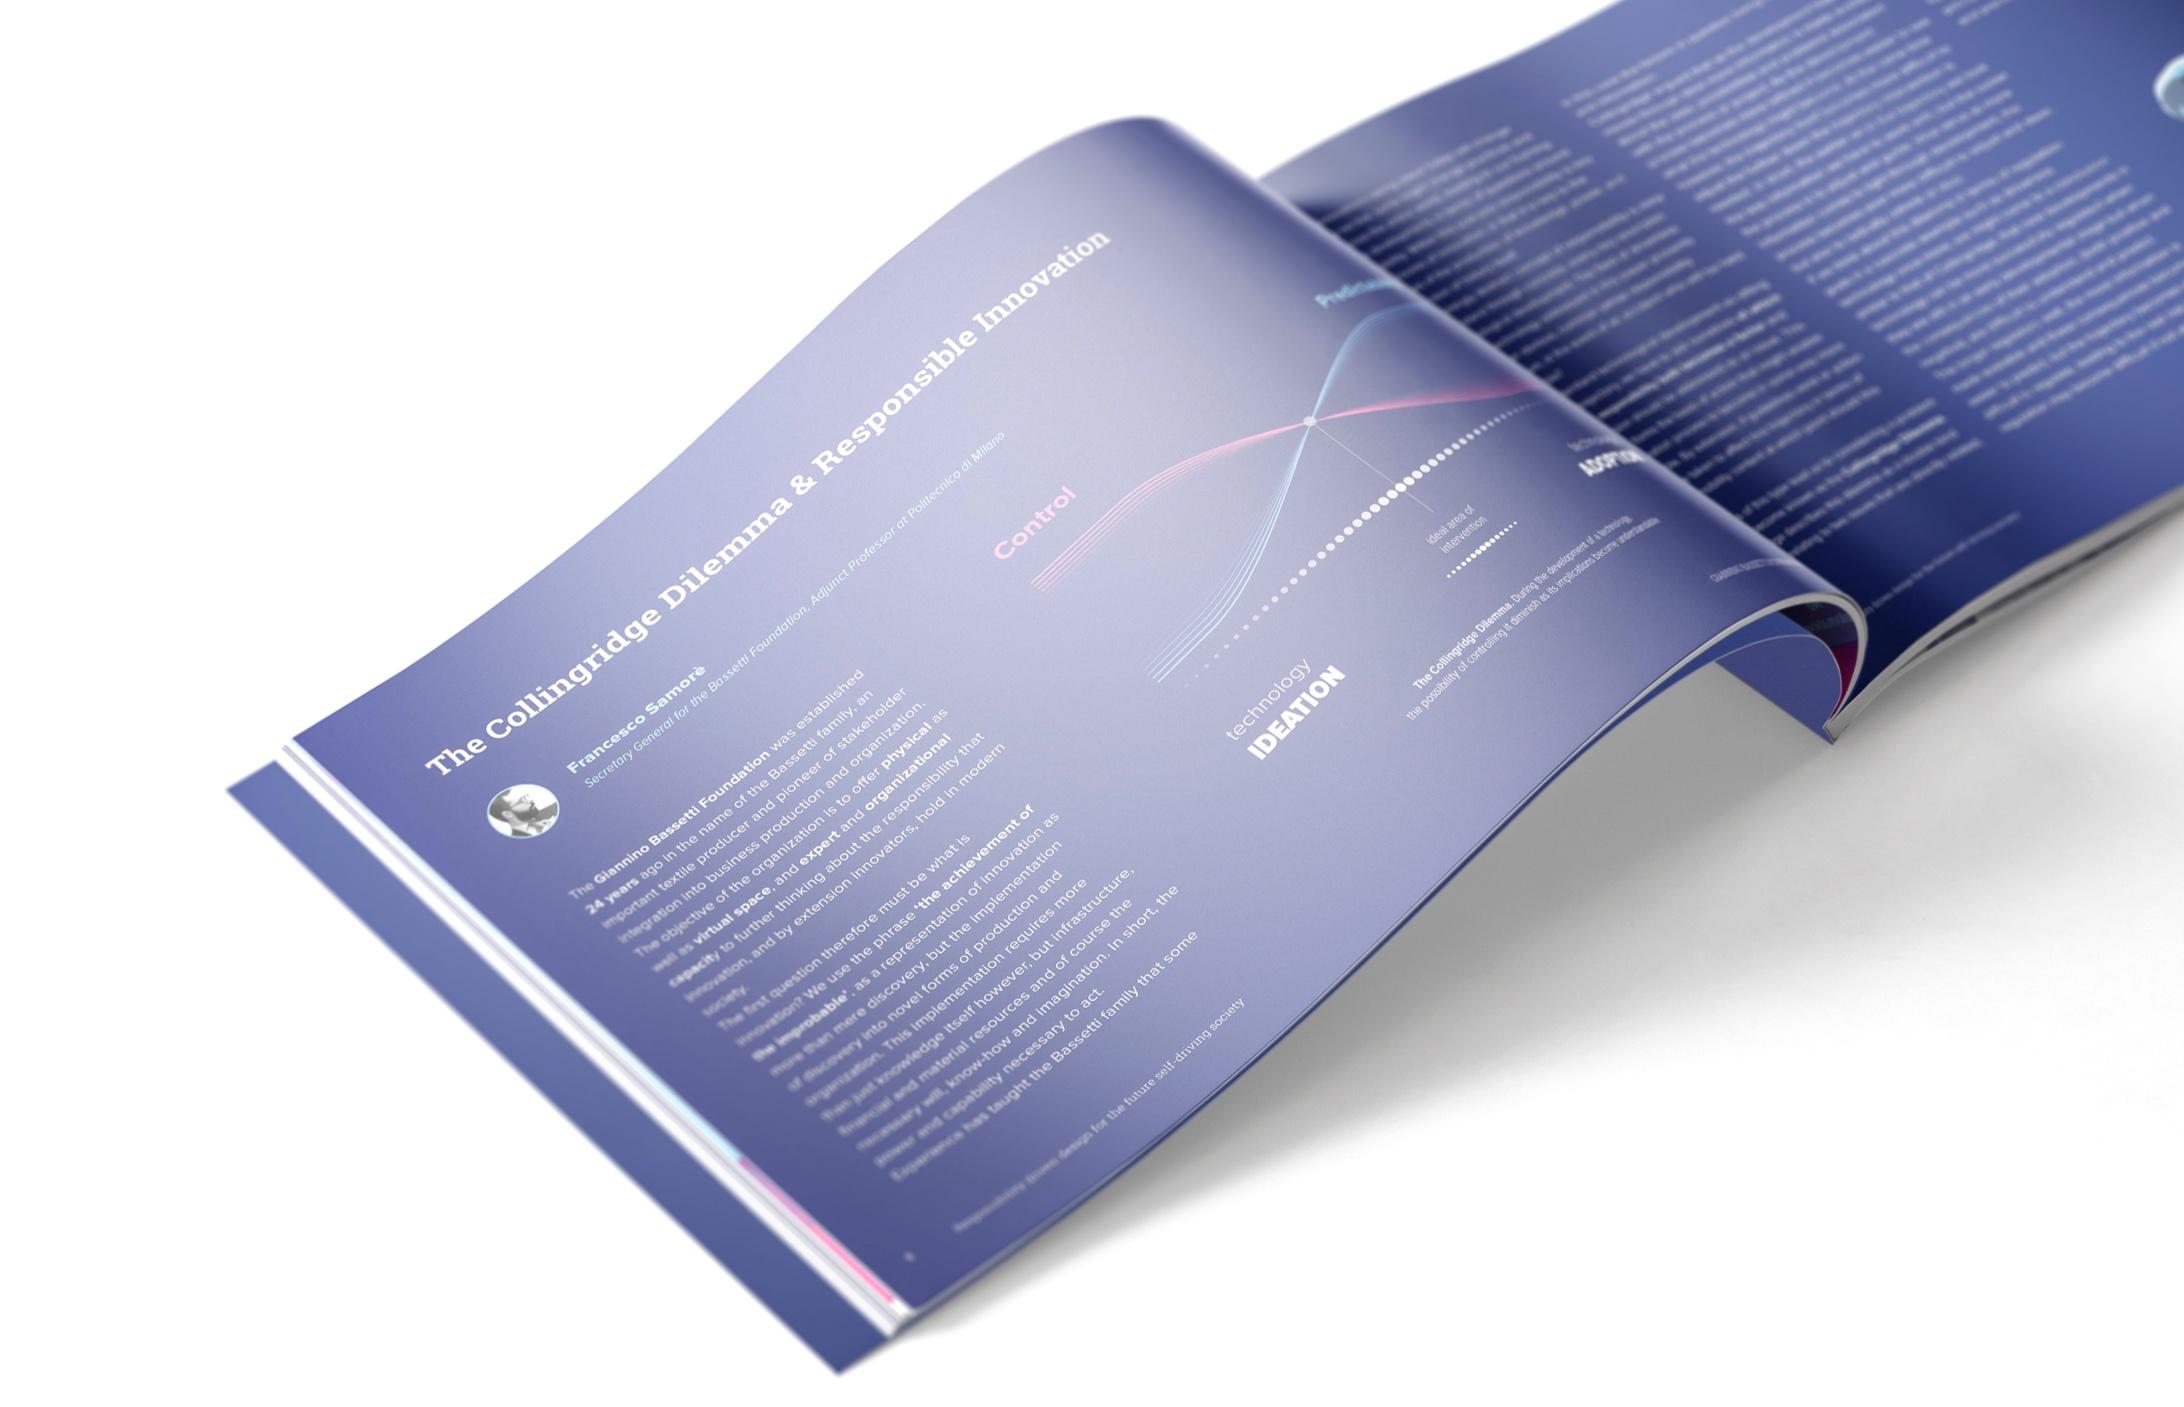 Self Driving Society Paper Collingridge - Fabio Besti Interdisciplinary Design